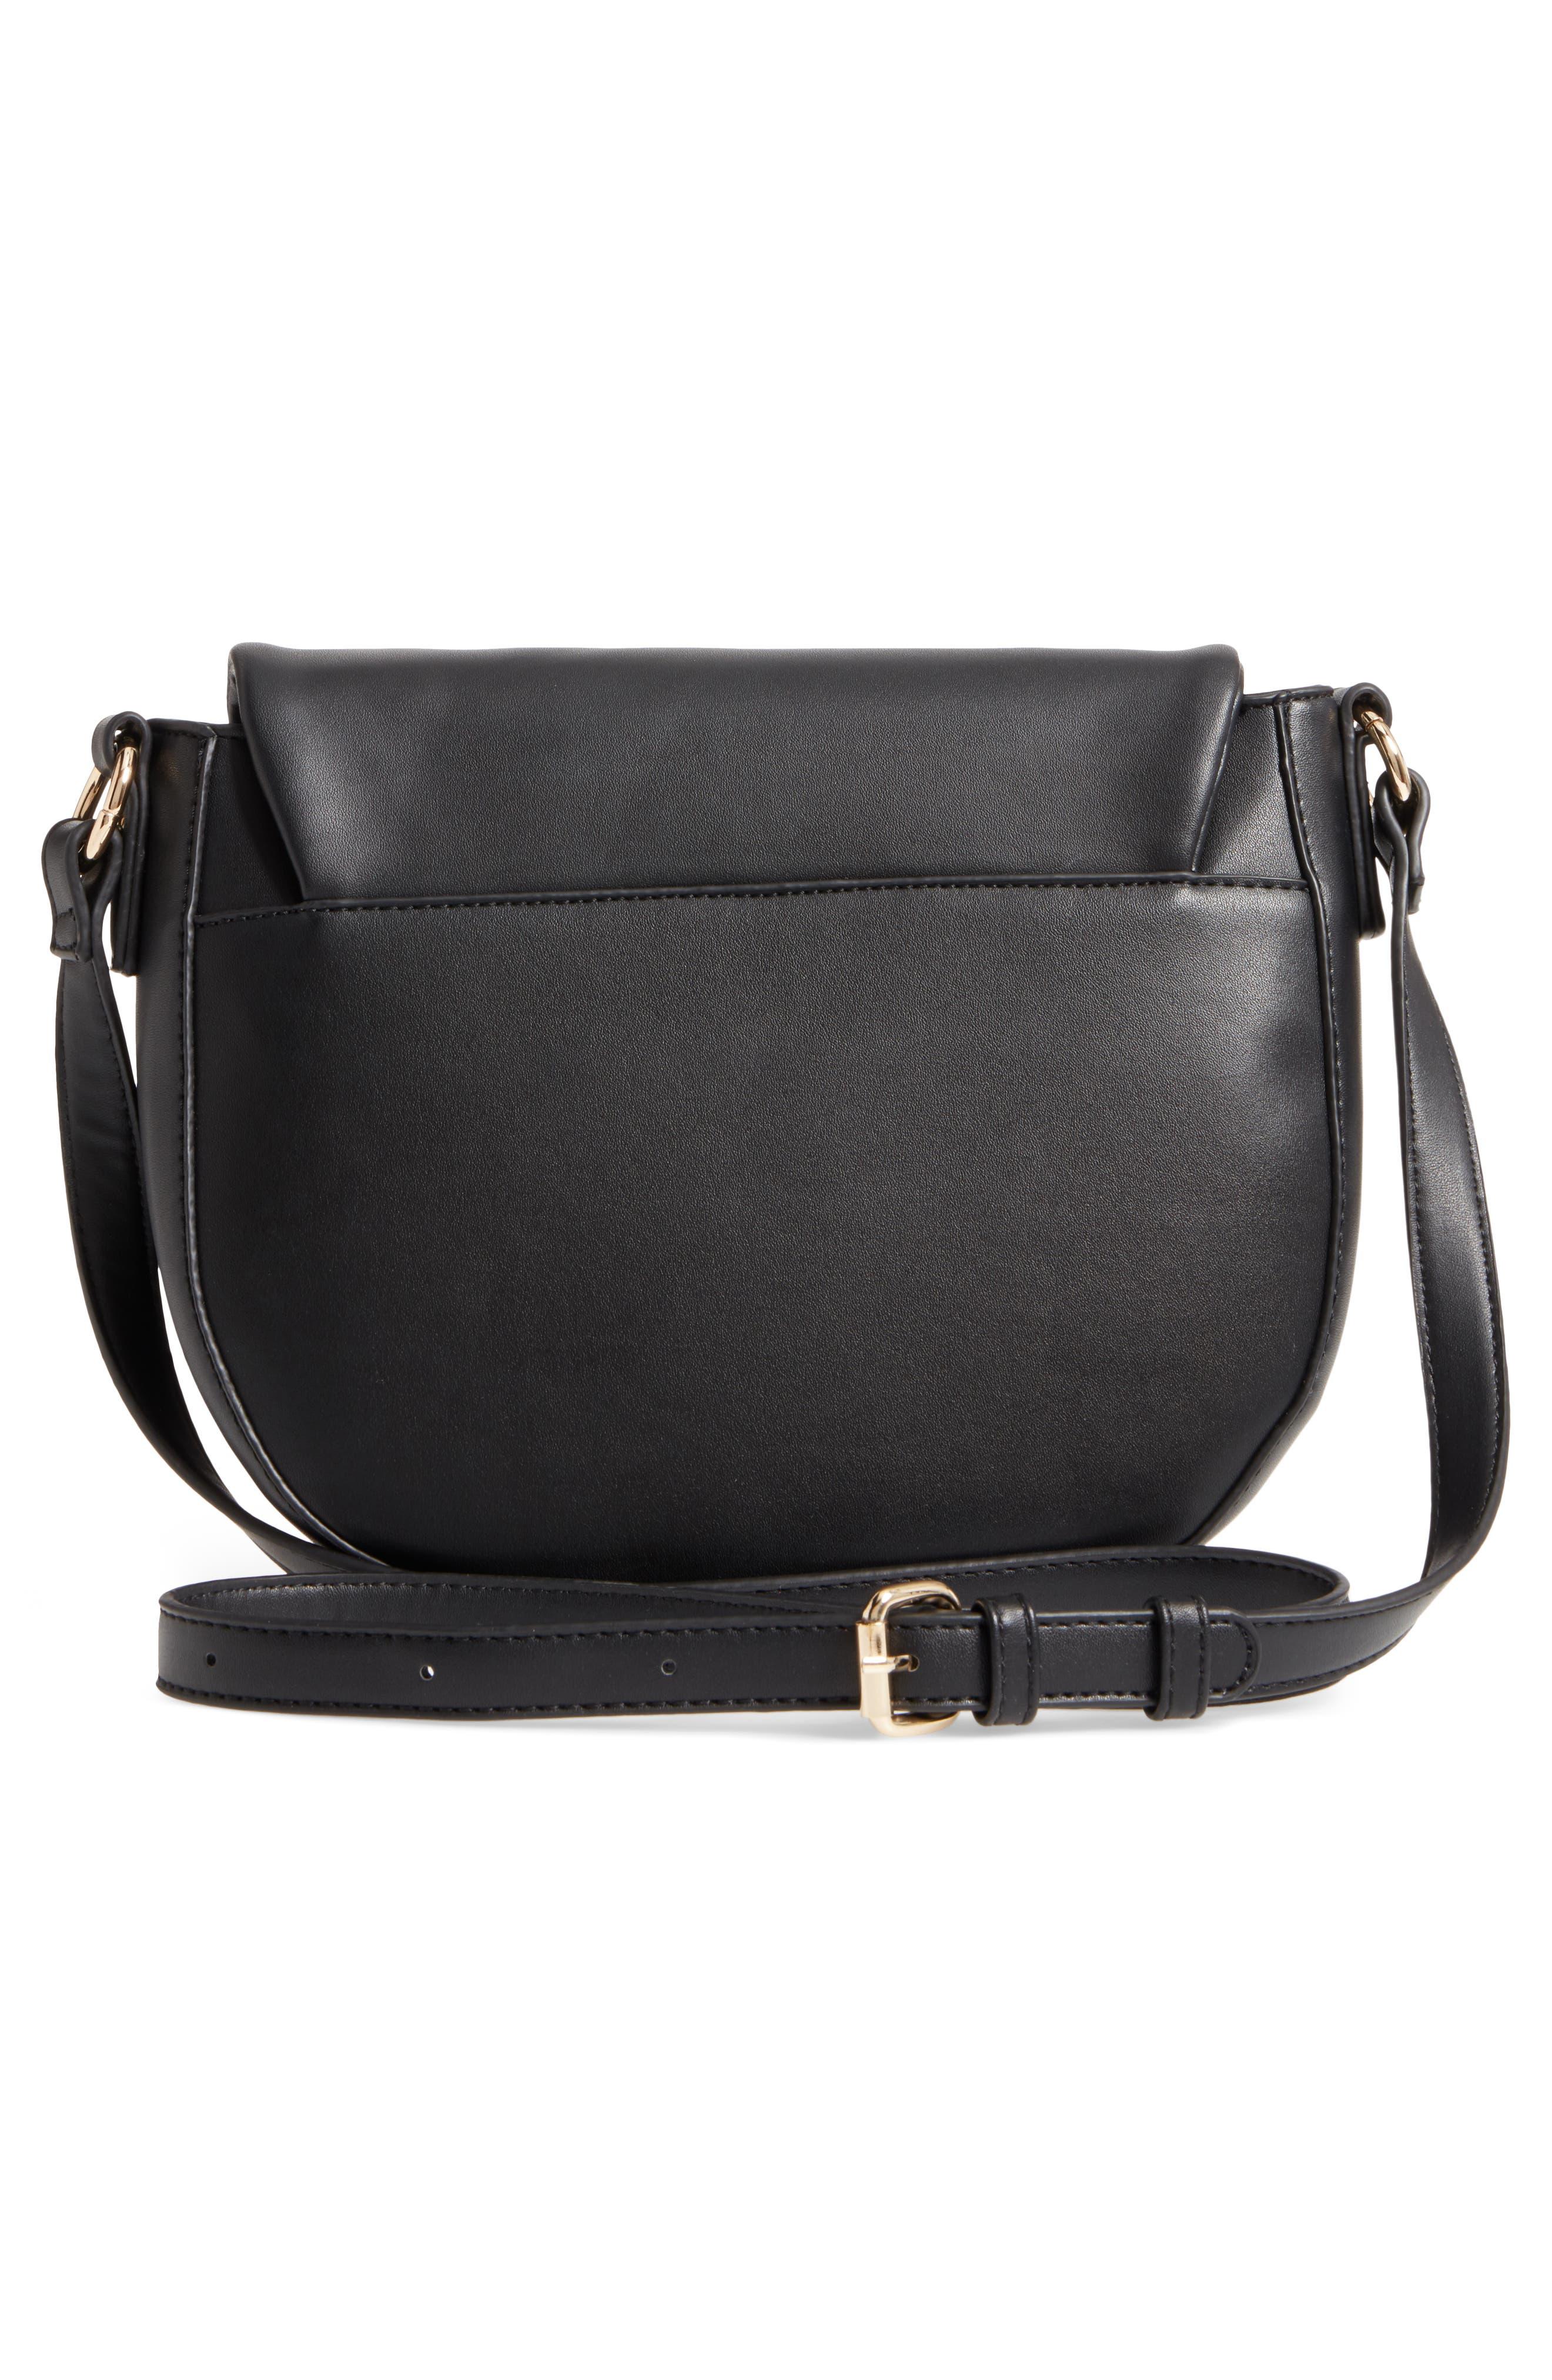 Adden Faux Leather Crossbody Bag,                             Alternate thumbnail 3, color,                             Black